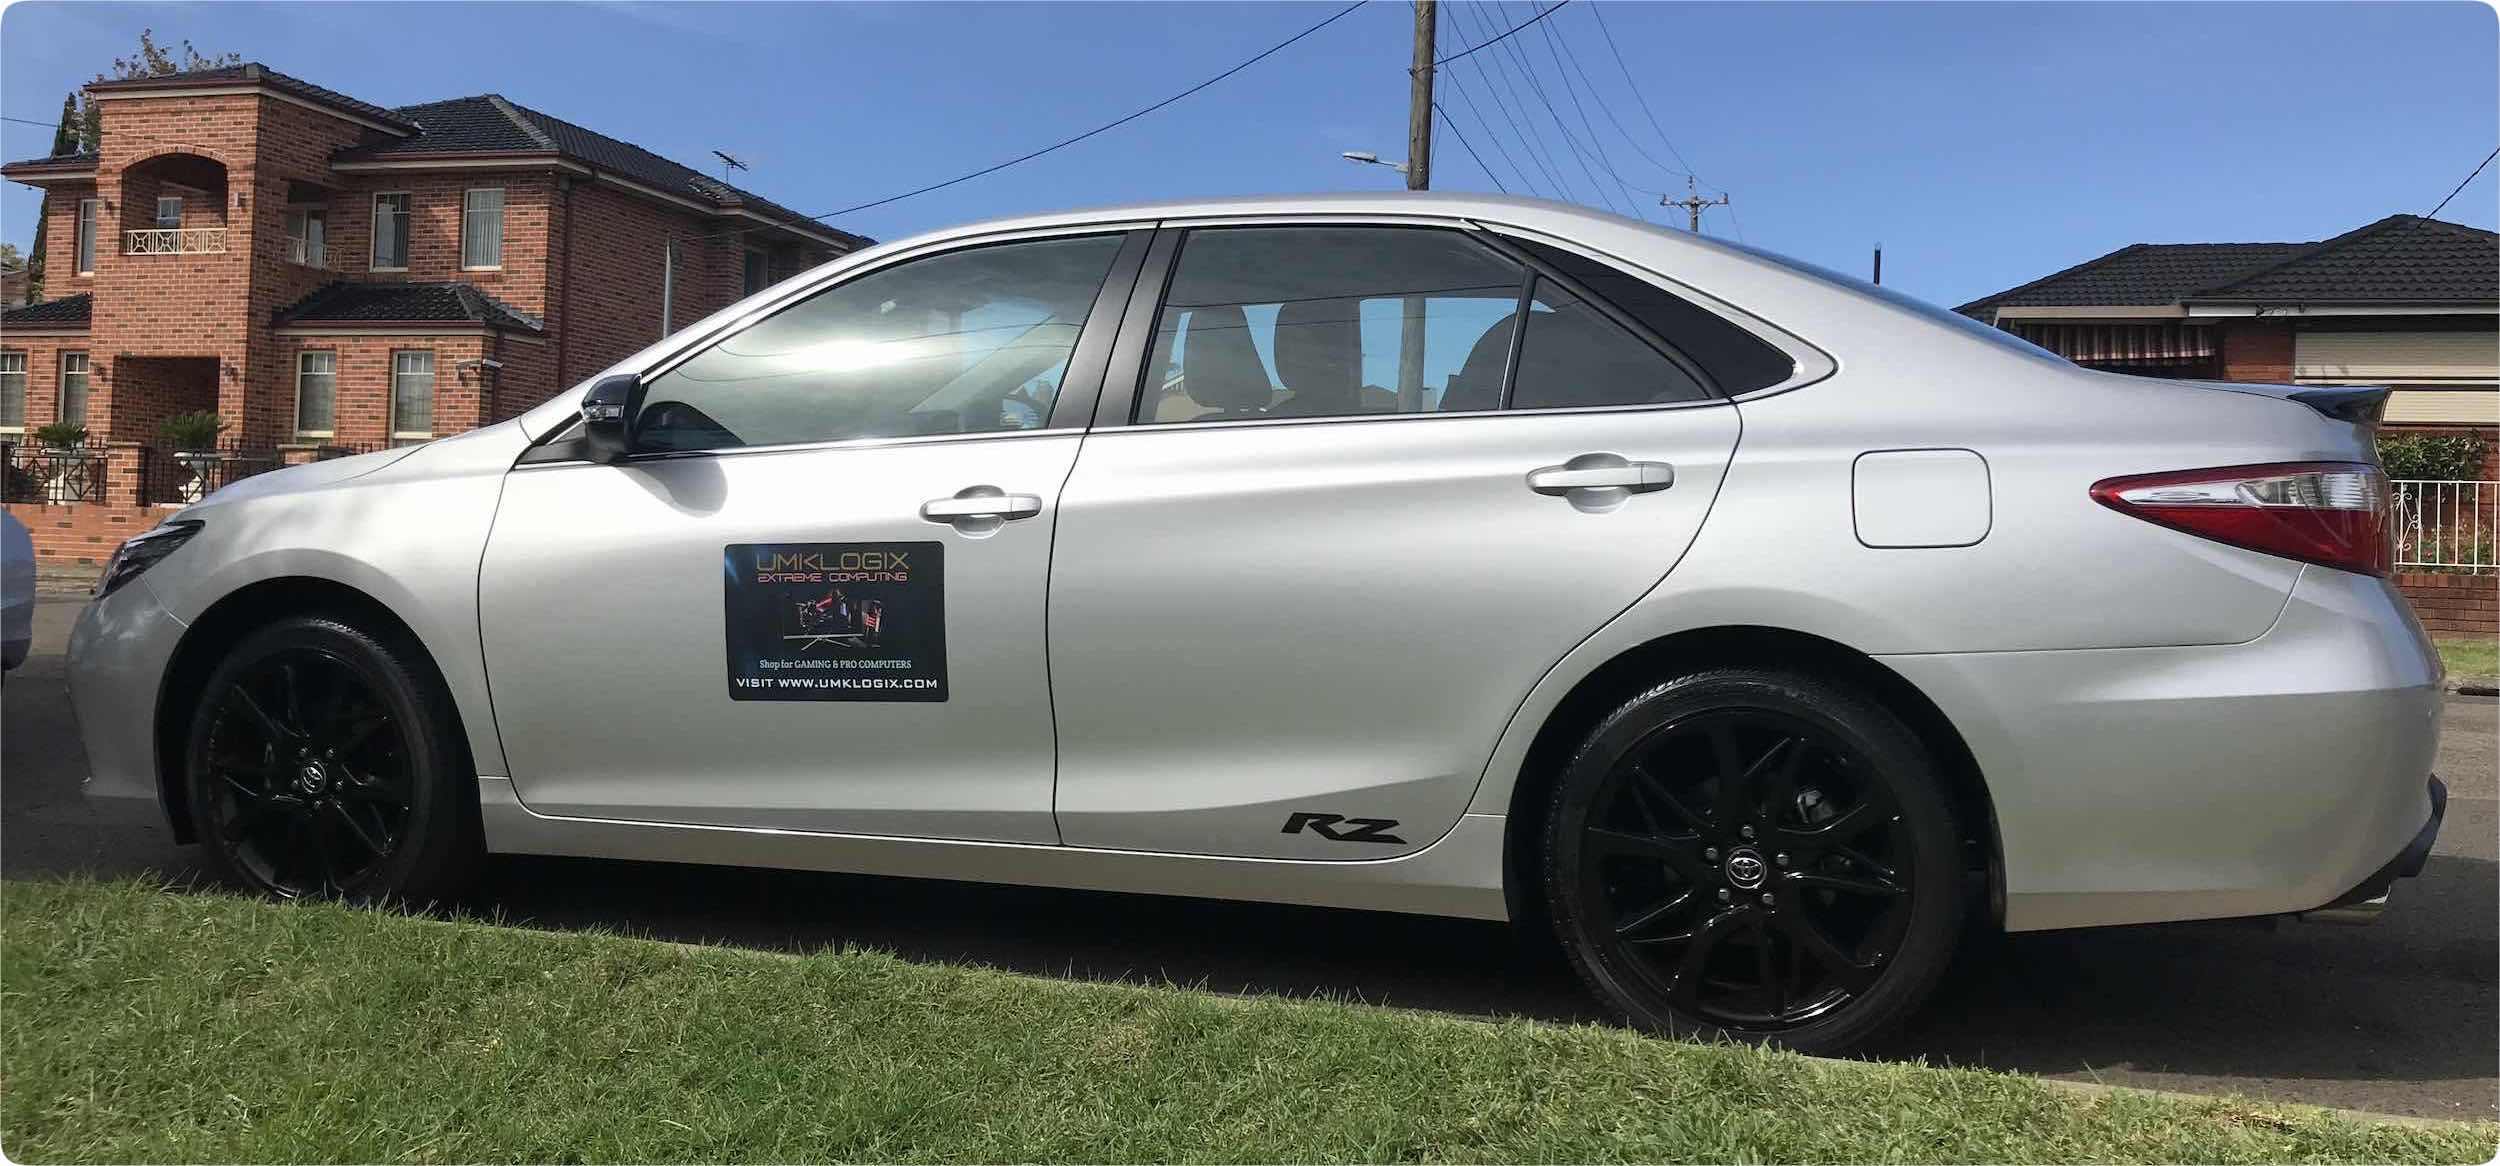 UMKLOGIX Car Delivery Sydney Australia